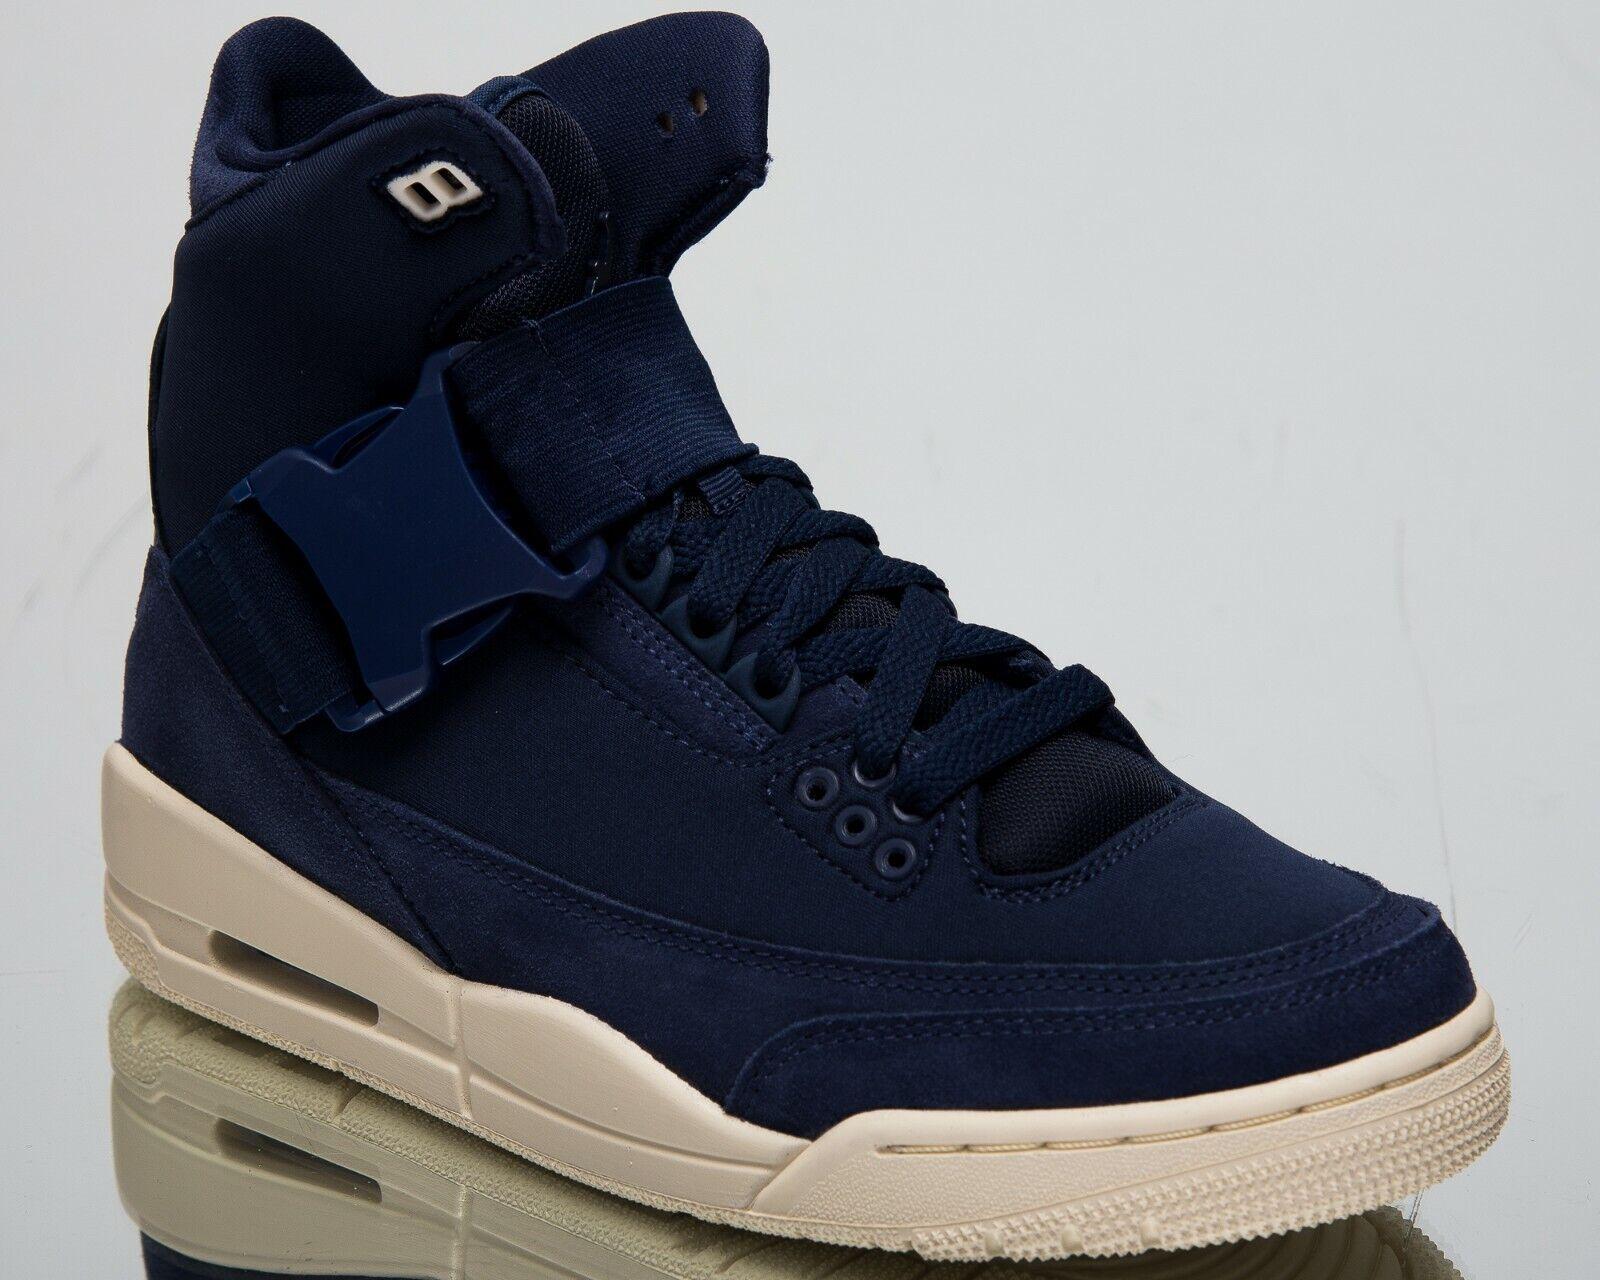 Aire jordan señora 3 retro Explorer XXL Lifestyle zapatos medianoche azul marino